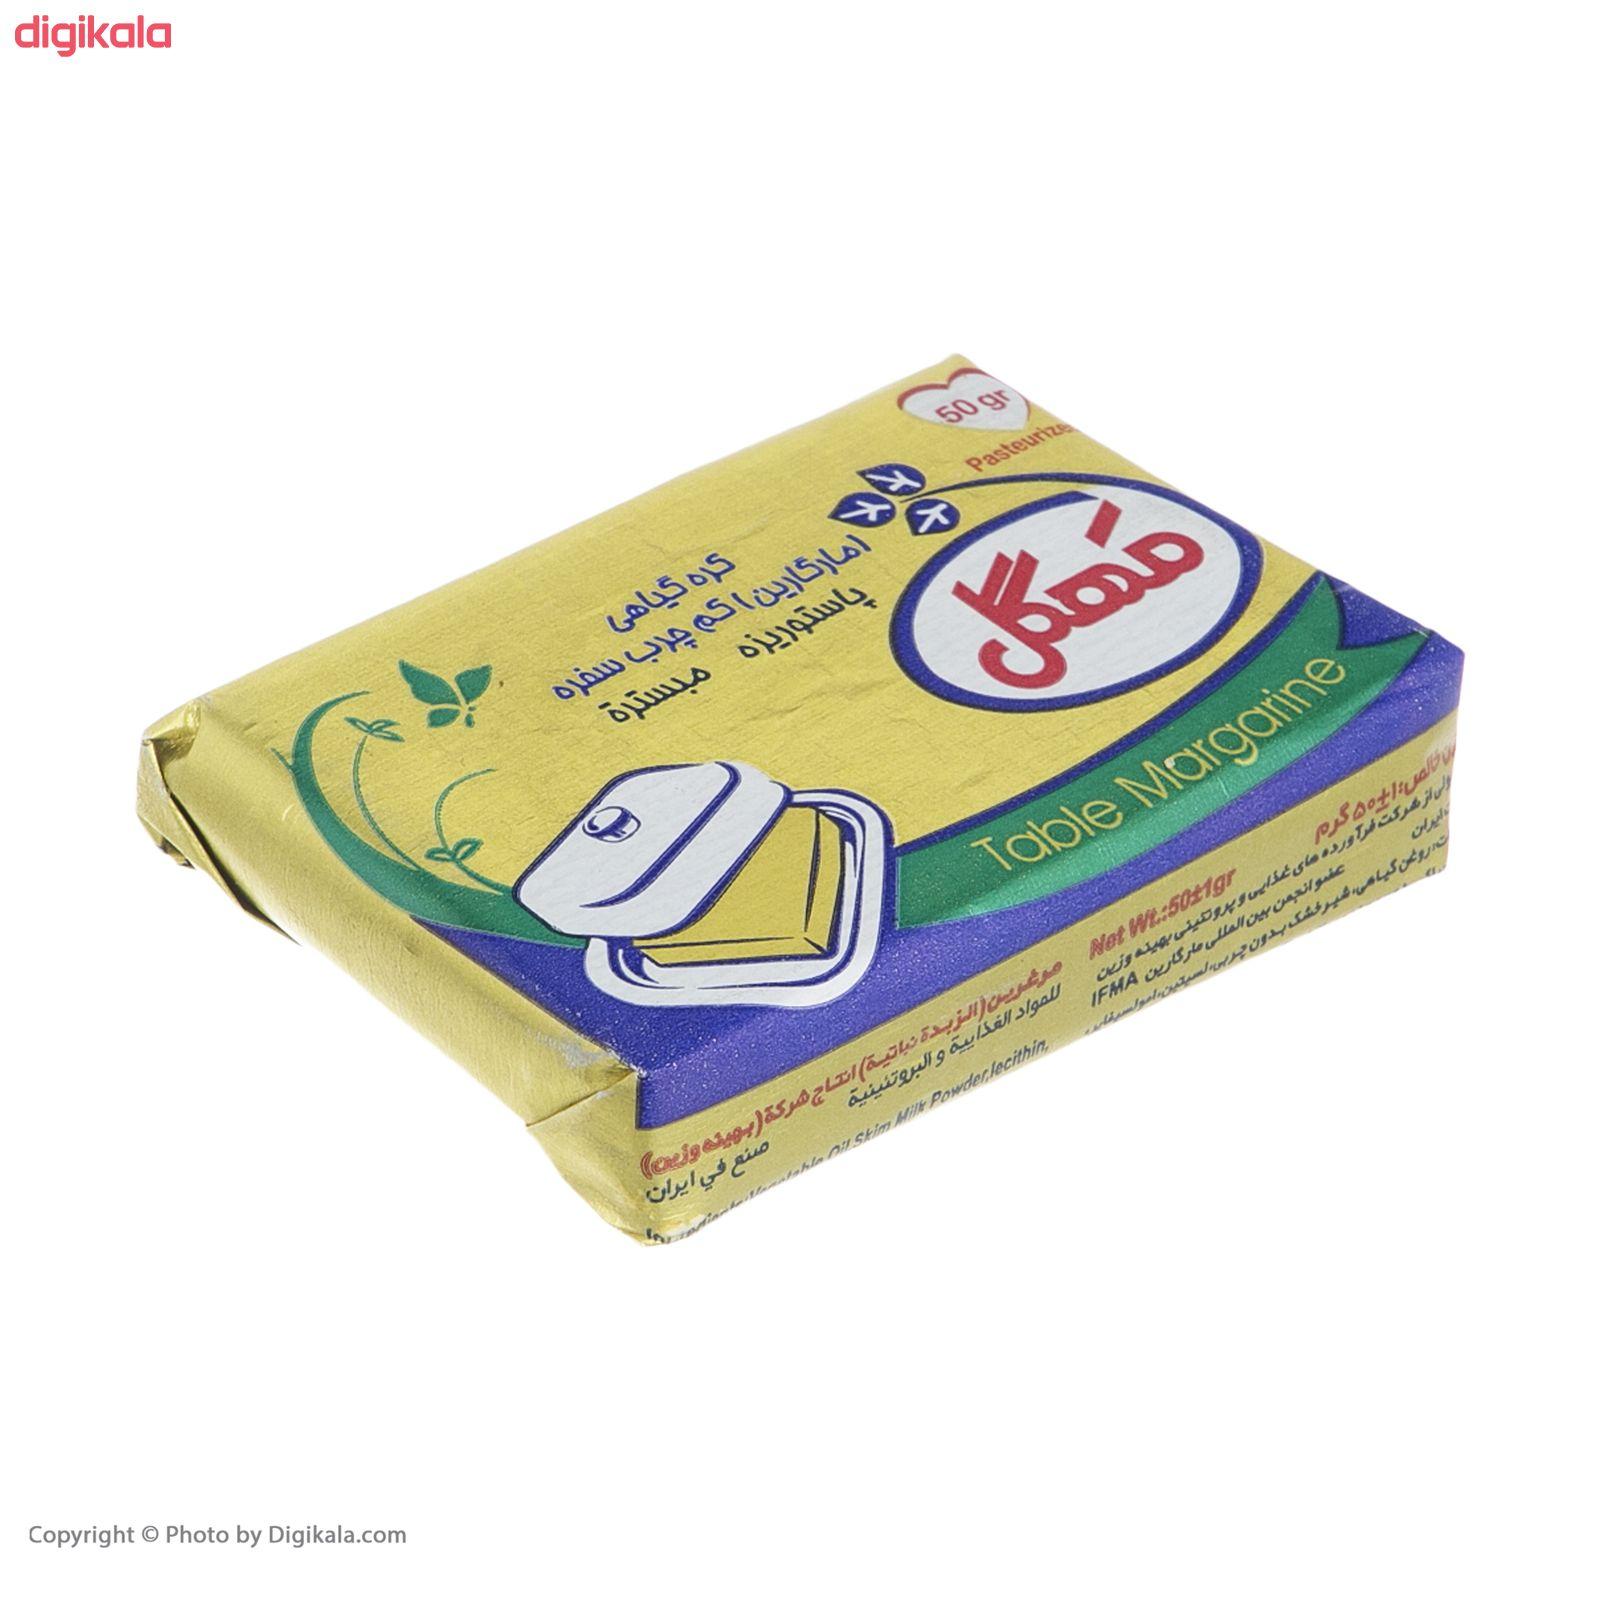 کره گیاهی مهگل - 50 گرم  main 1 3